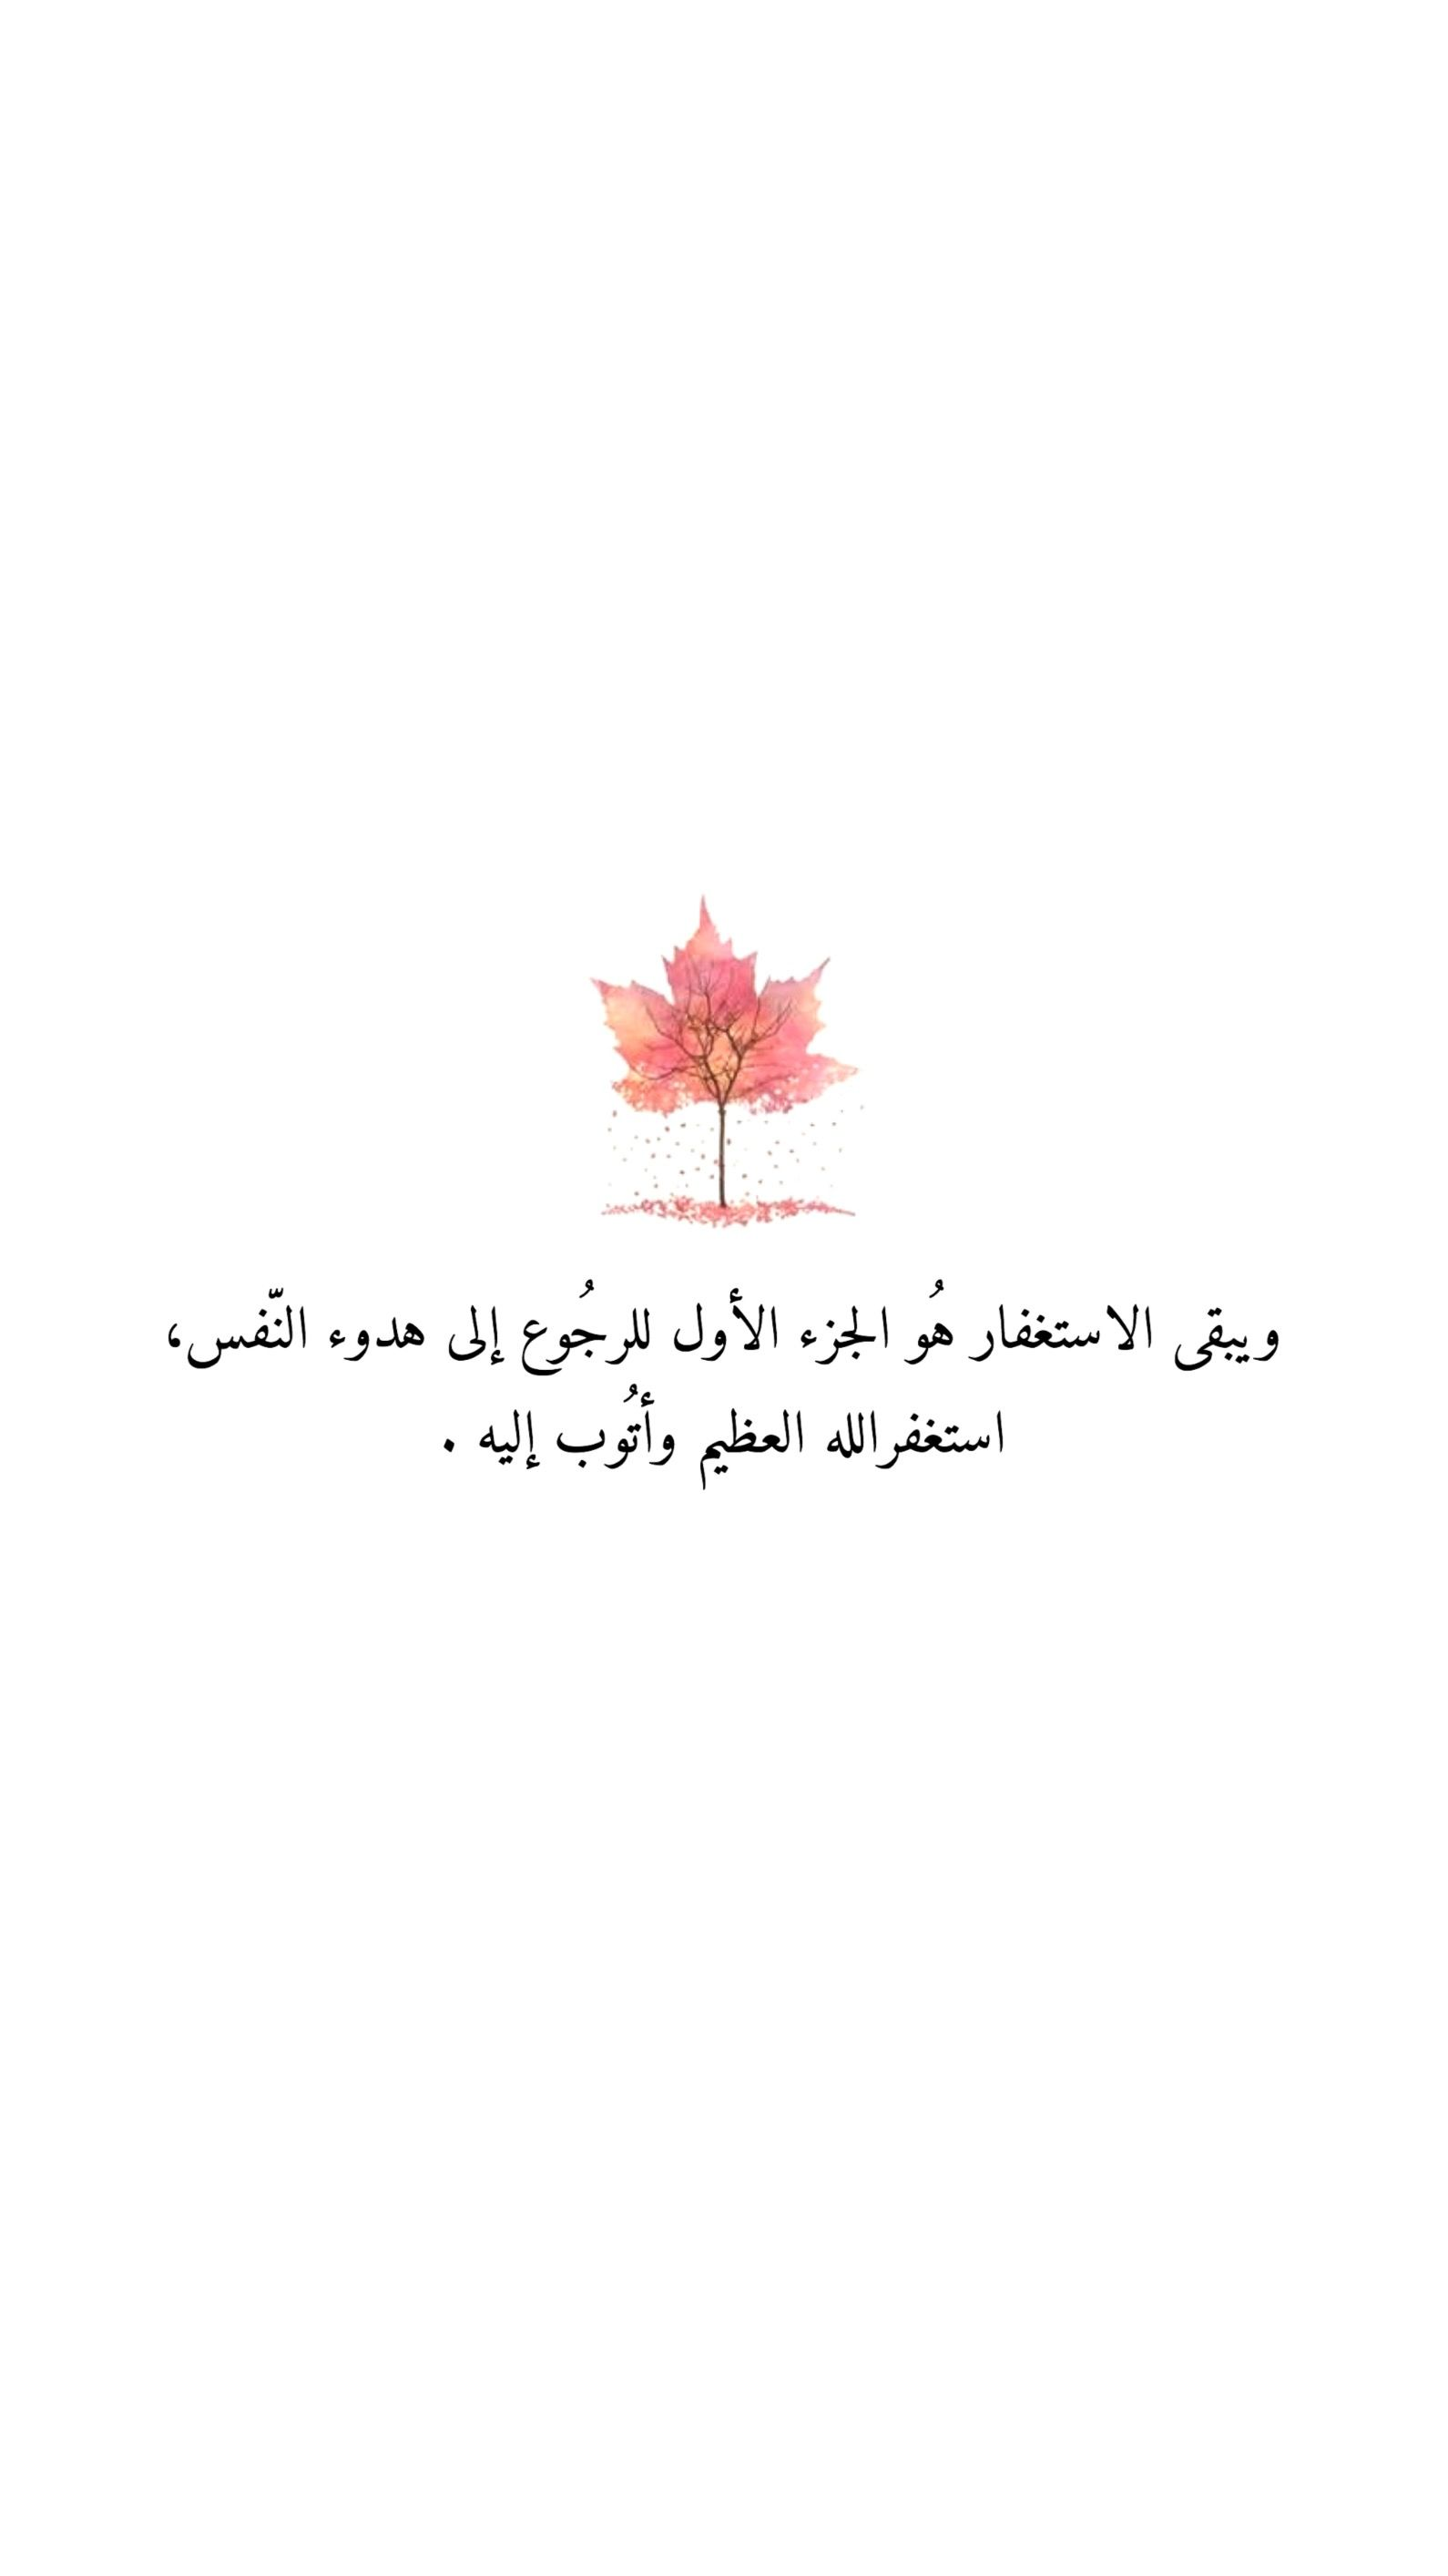 استغفار استغفرالله Islamic Love Quotes Quran Quotes Love Quotes For Book Lovers